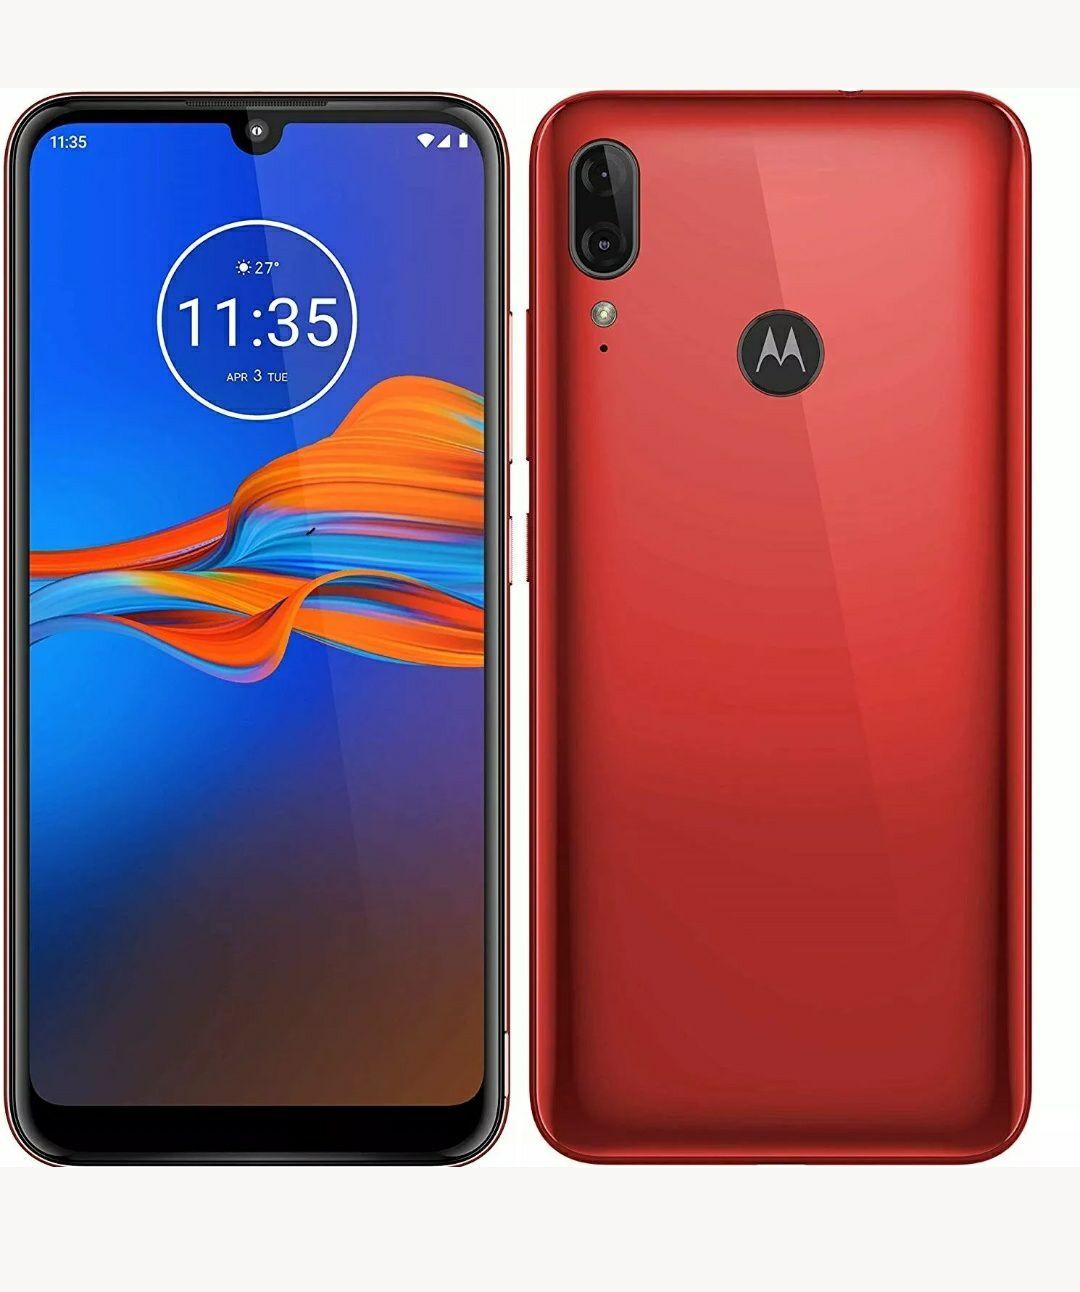 Motorola Moto E6 Plus 32GB Smartphone Grade B £64.69 | Moto E6 Play 32GB Grade B £56.69 @ Cheapest_Electrical Ebay